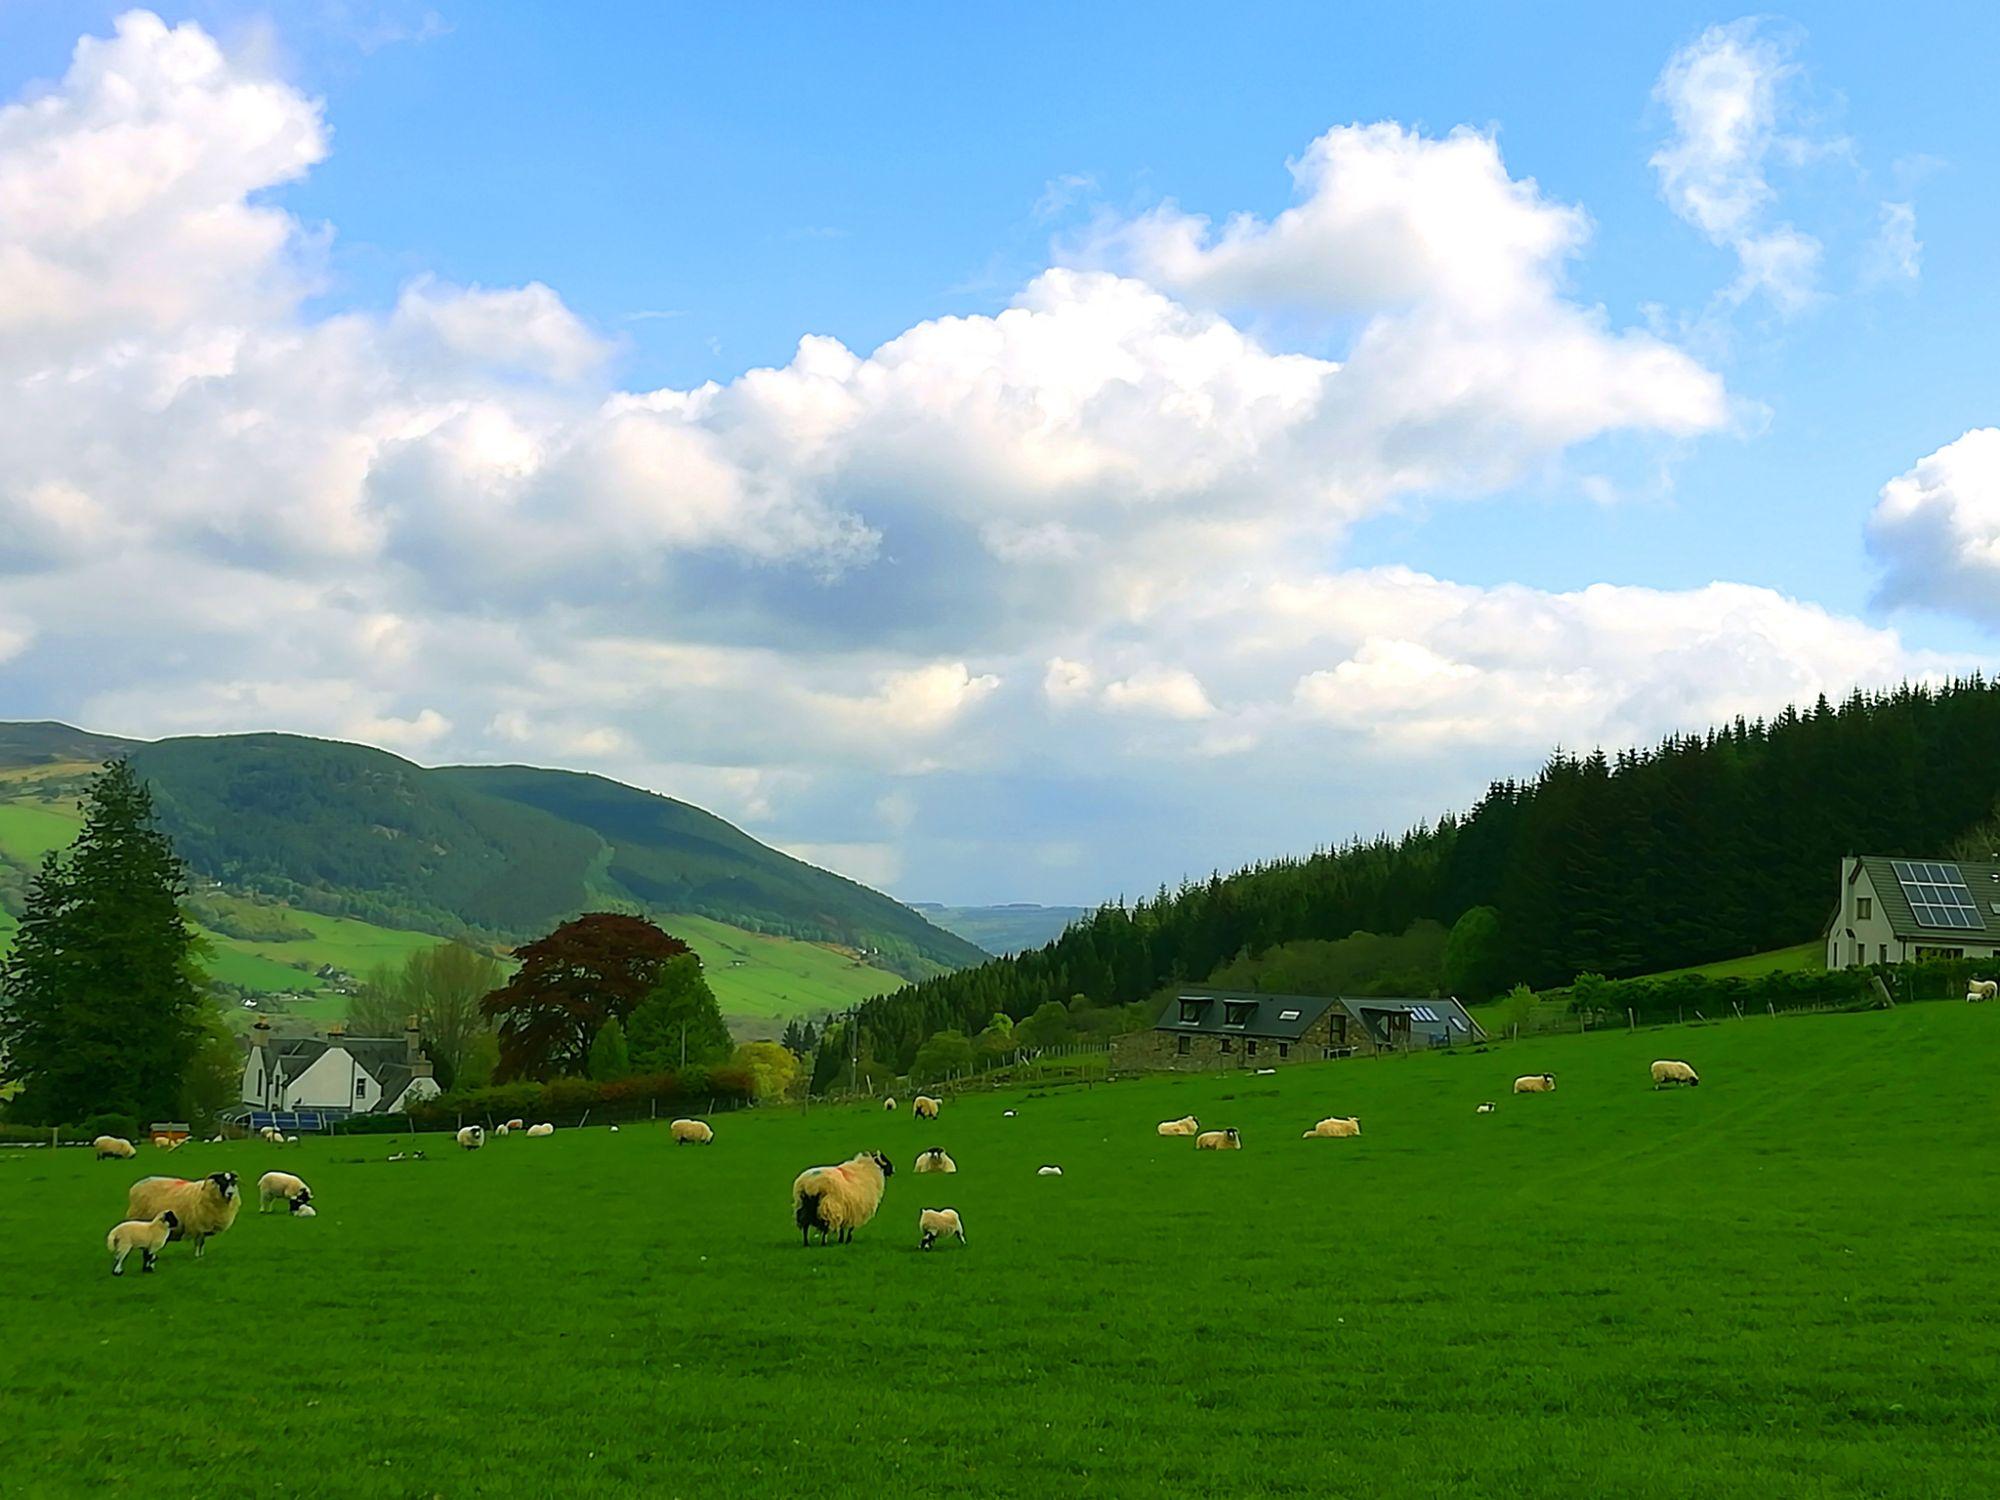 A tranquil Scottish village